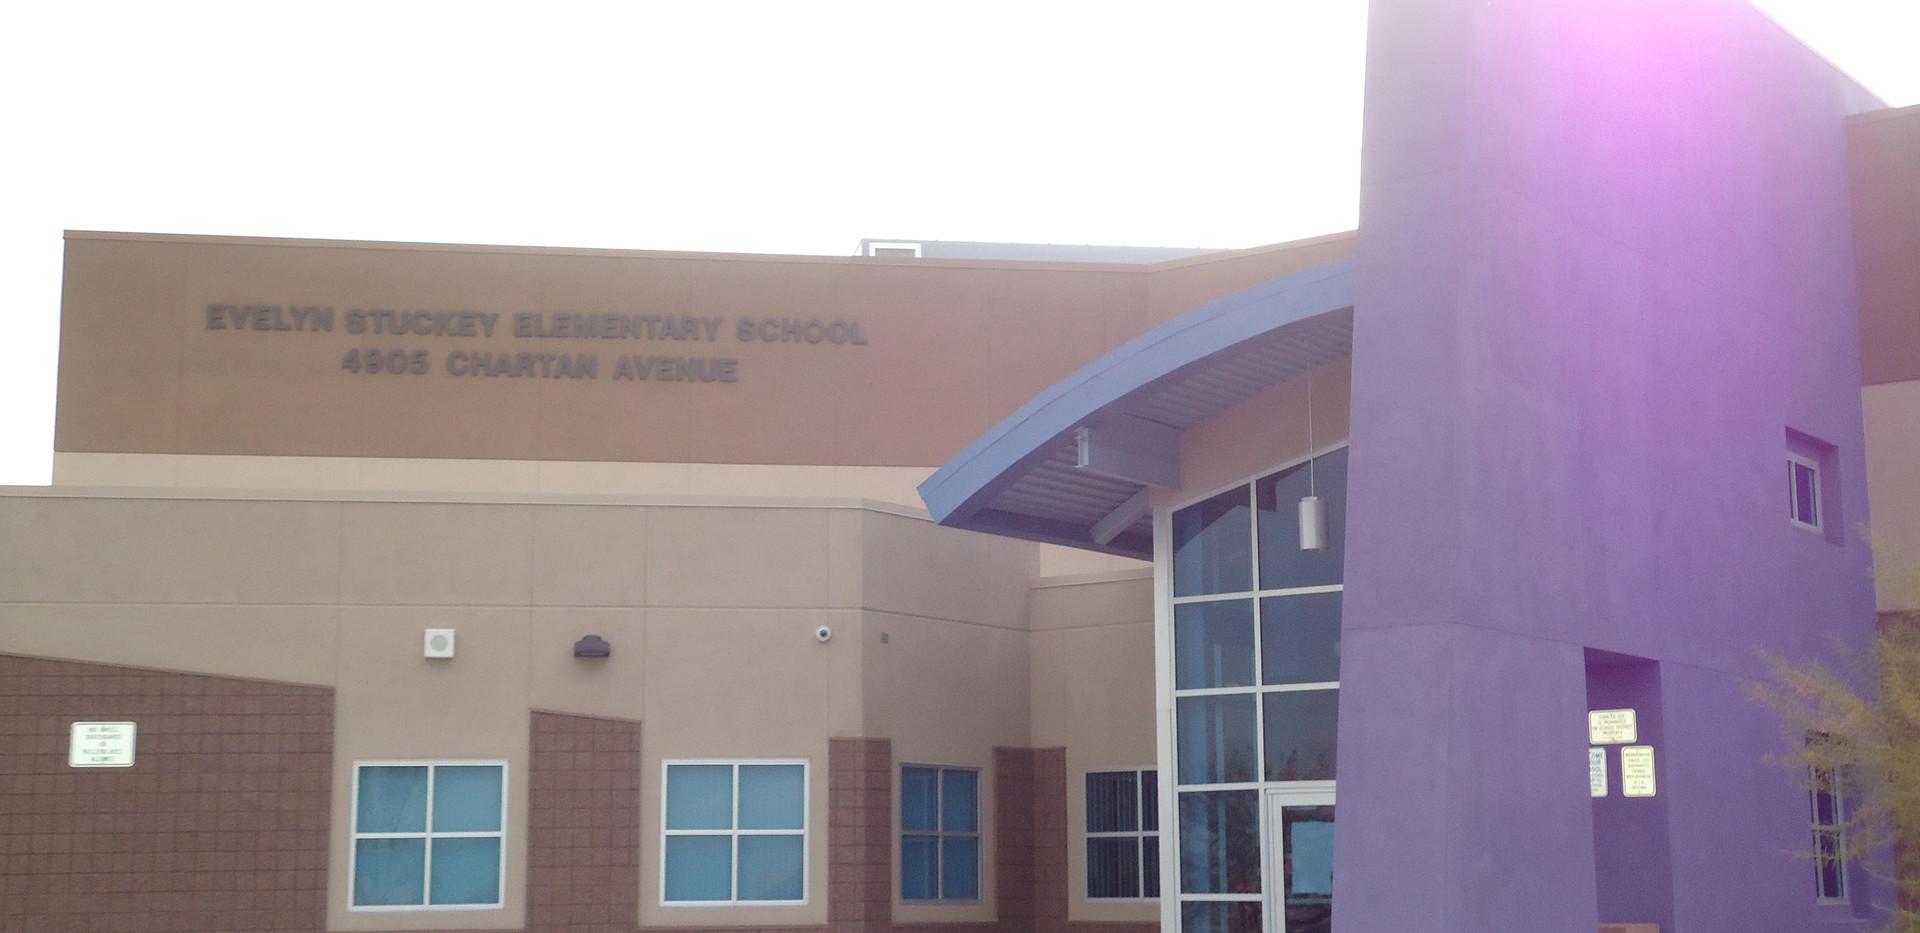 Evelyn Stucket Elementary School A-1 Masonry & Sandblasting, Nevada's Premier Masonry Contractor